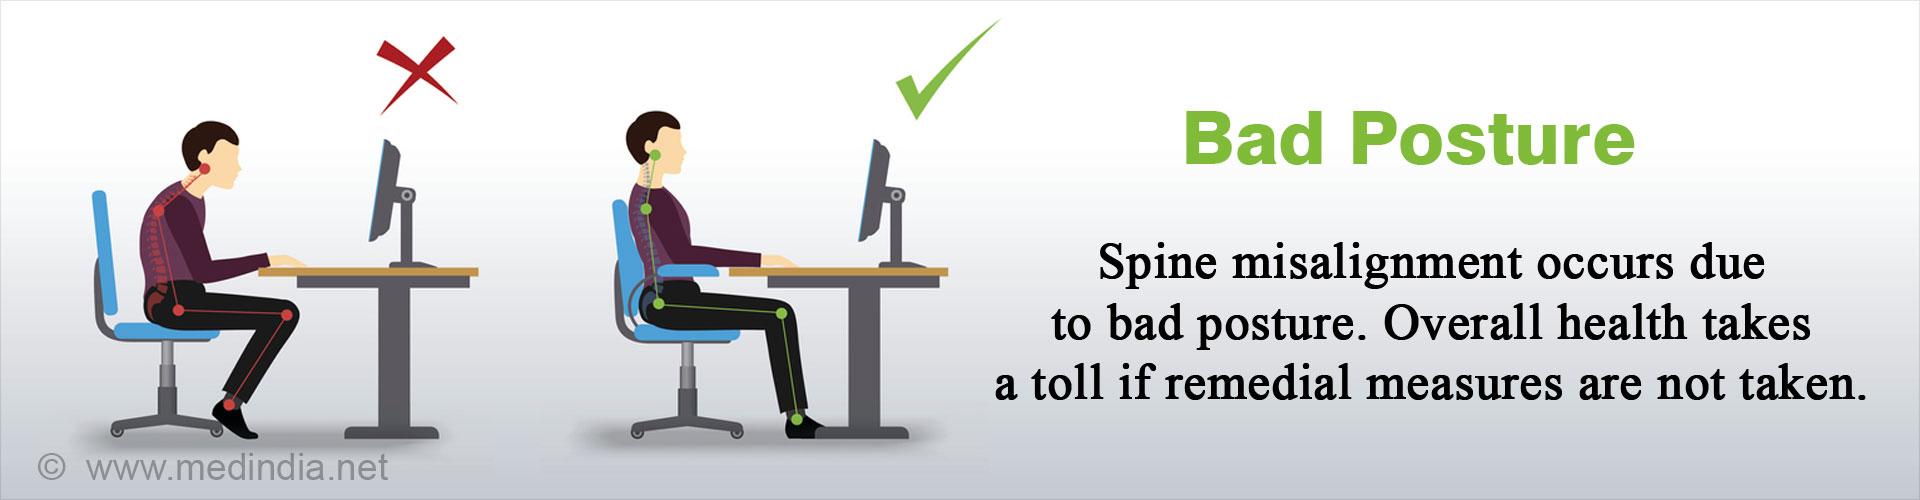 Top 7 Risks of Bad Posture